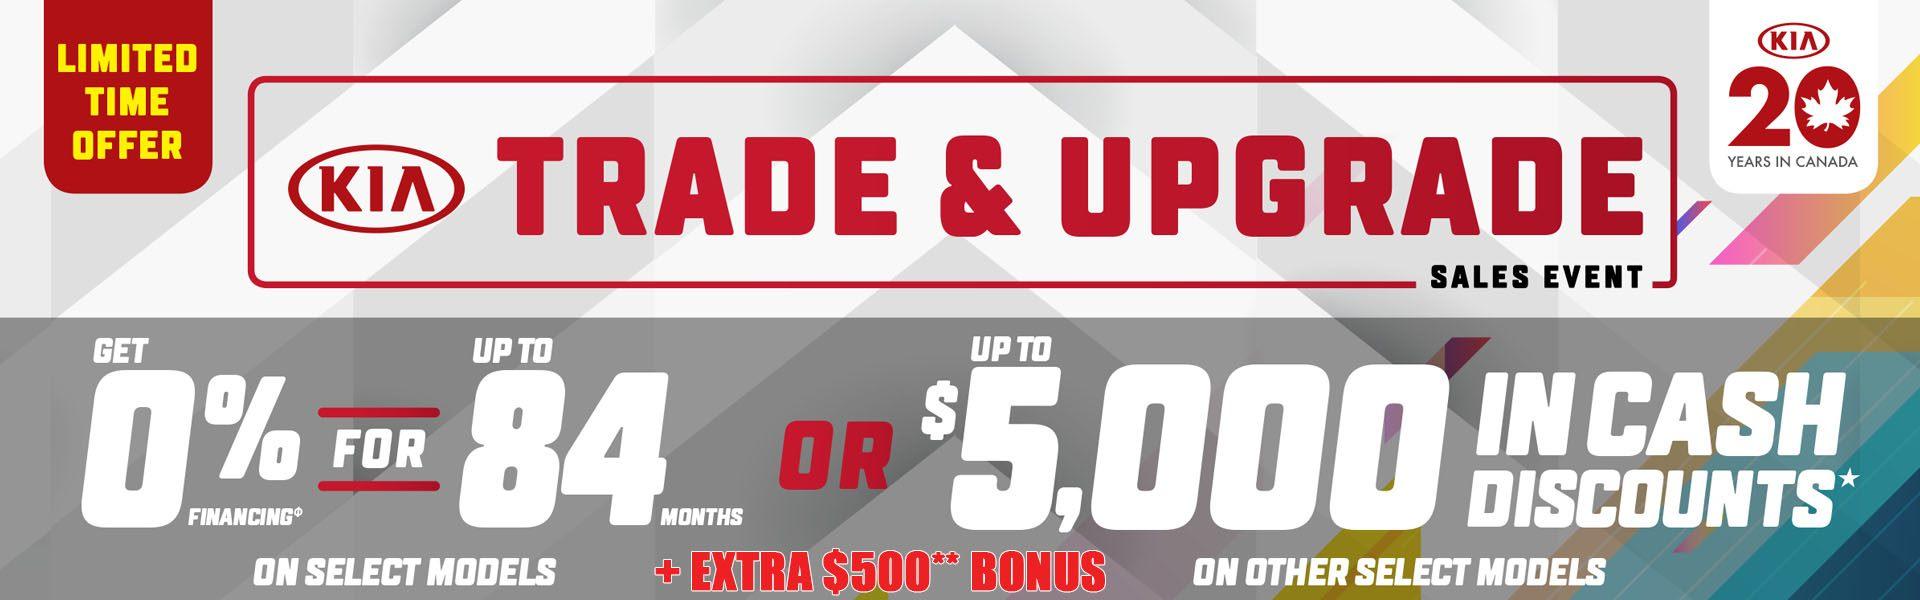 Kia Trade & Upgrade Sales Event